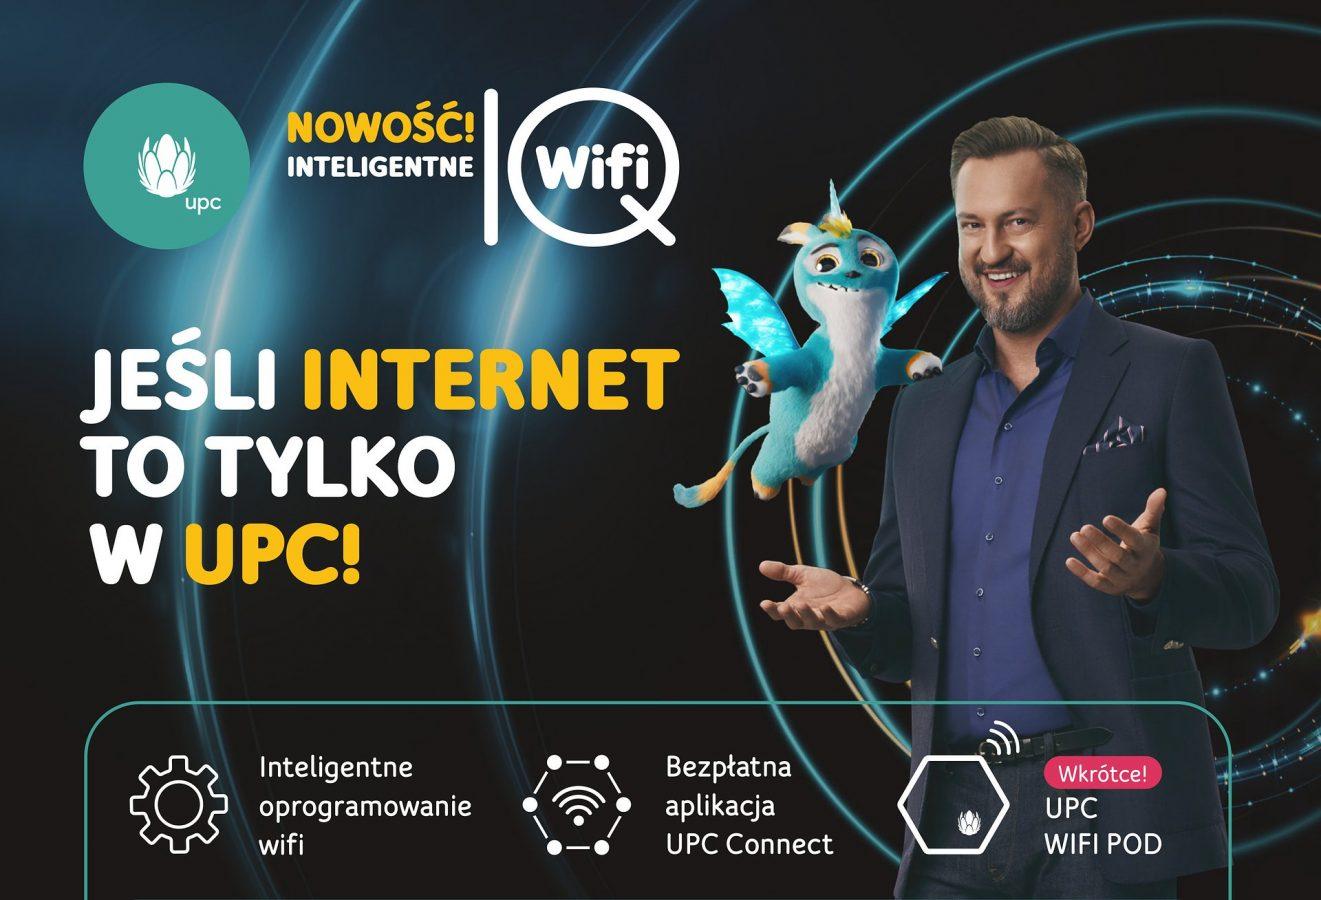 UPC Inteligentne WiFi